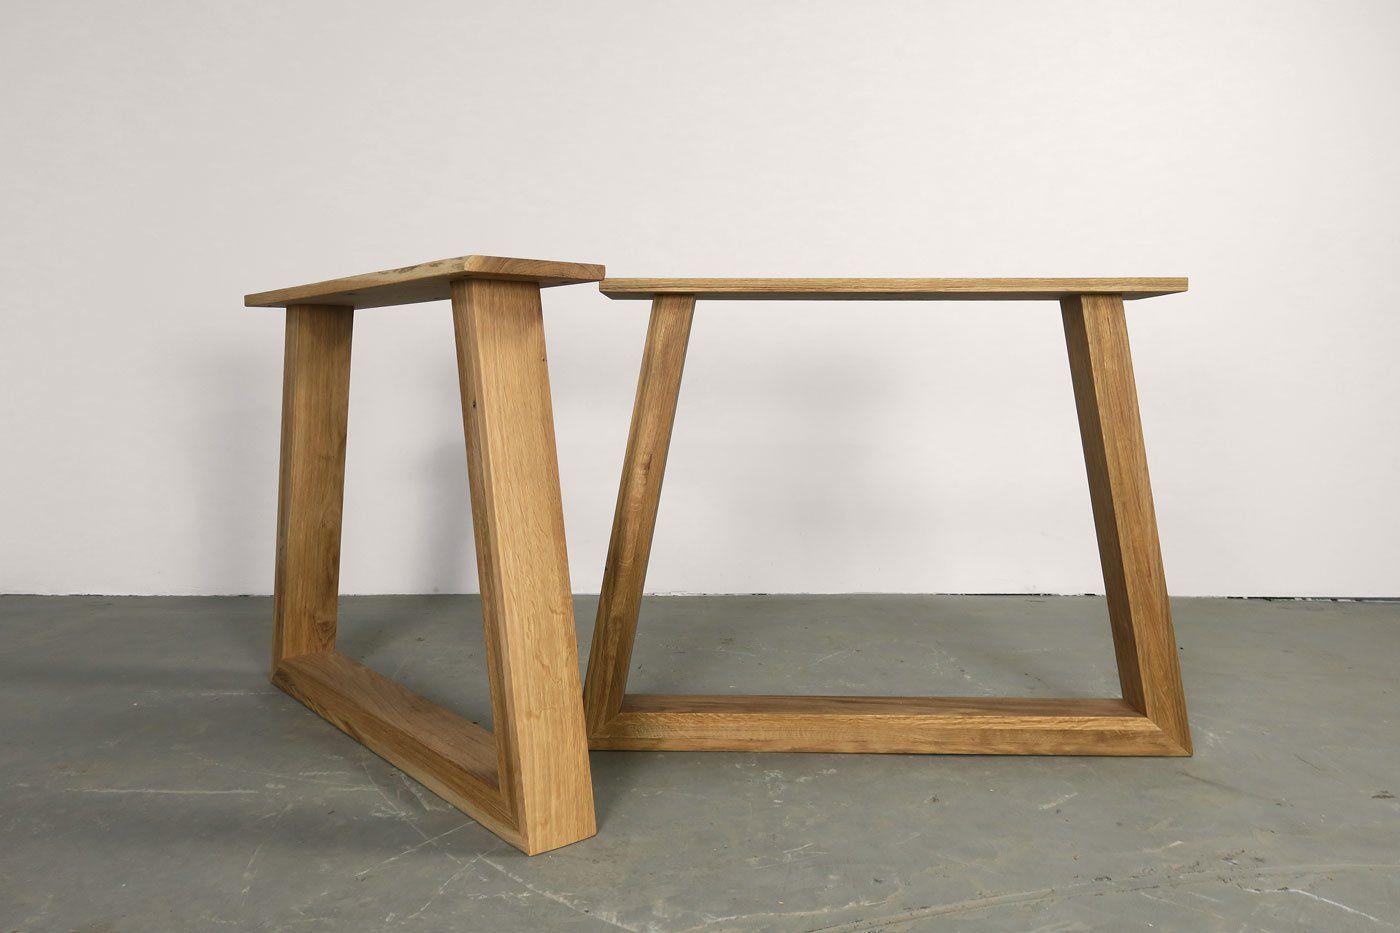 Eiche Tischgestell Massiv Kennet Festgrosse 2er Set Tischgestell